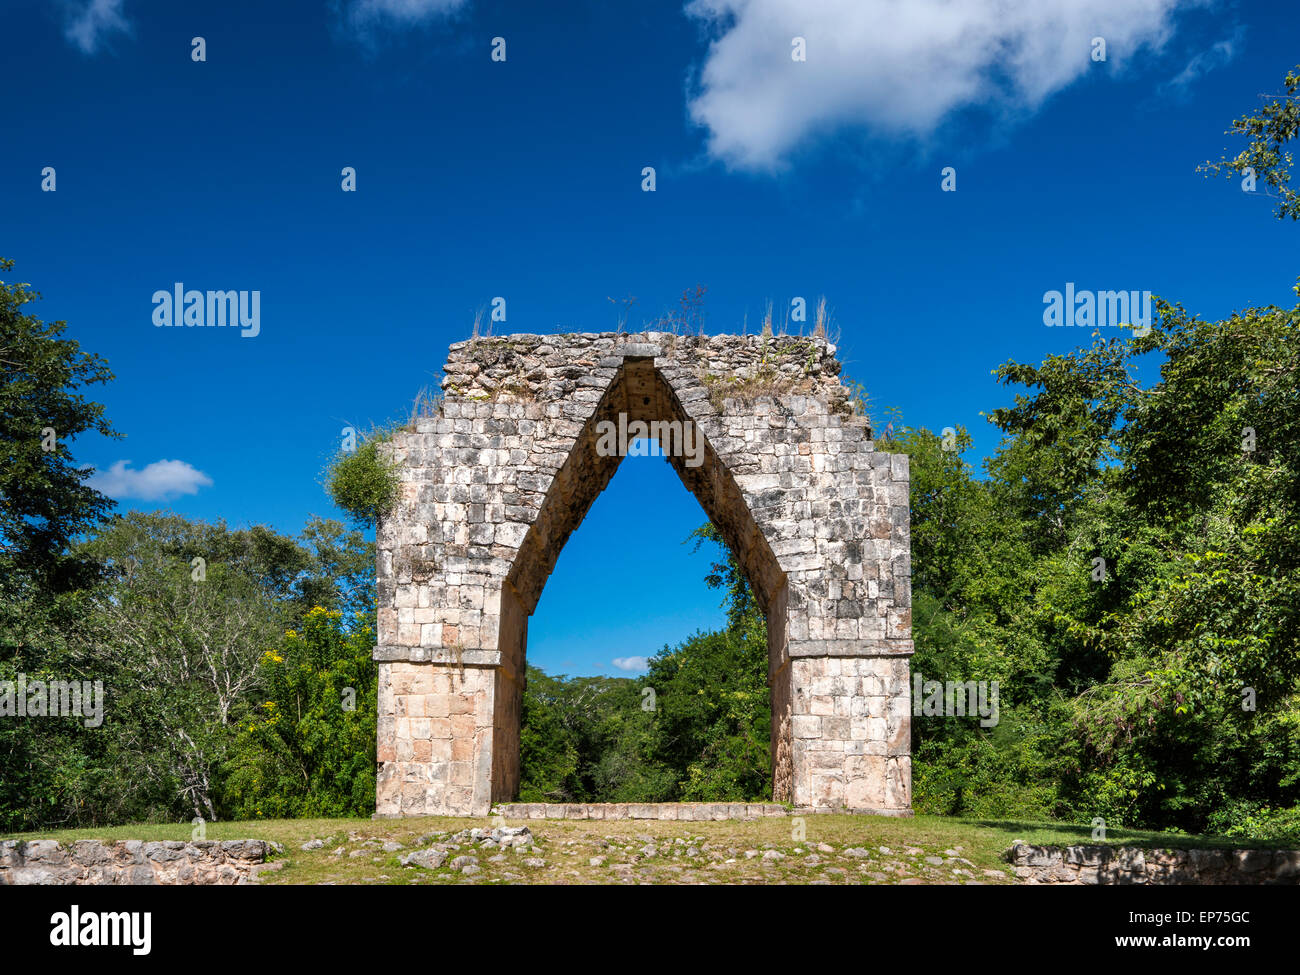 El Arco, Maya ruins at Kabah archaelogical site, Ruta Puuc, Yucatan state, Mexico - Stock Image